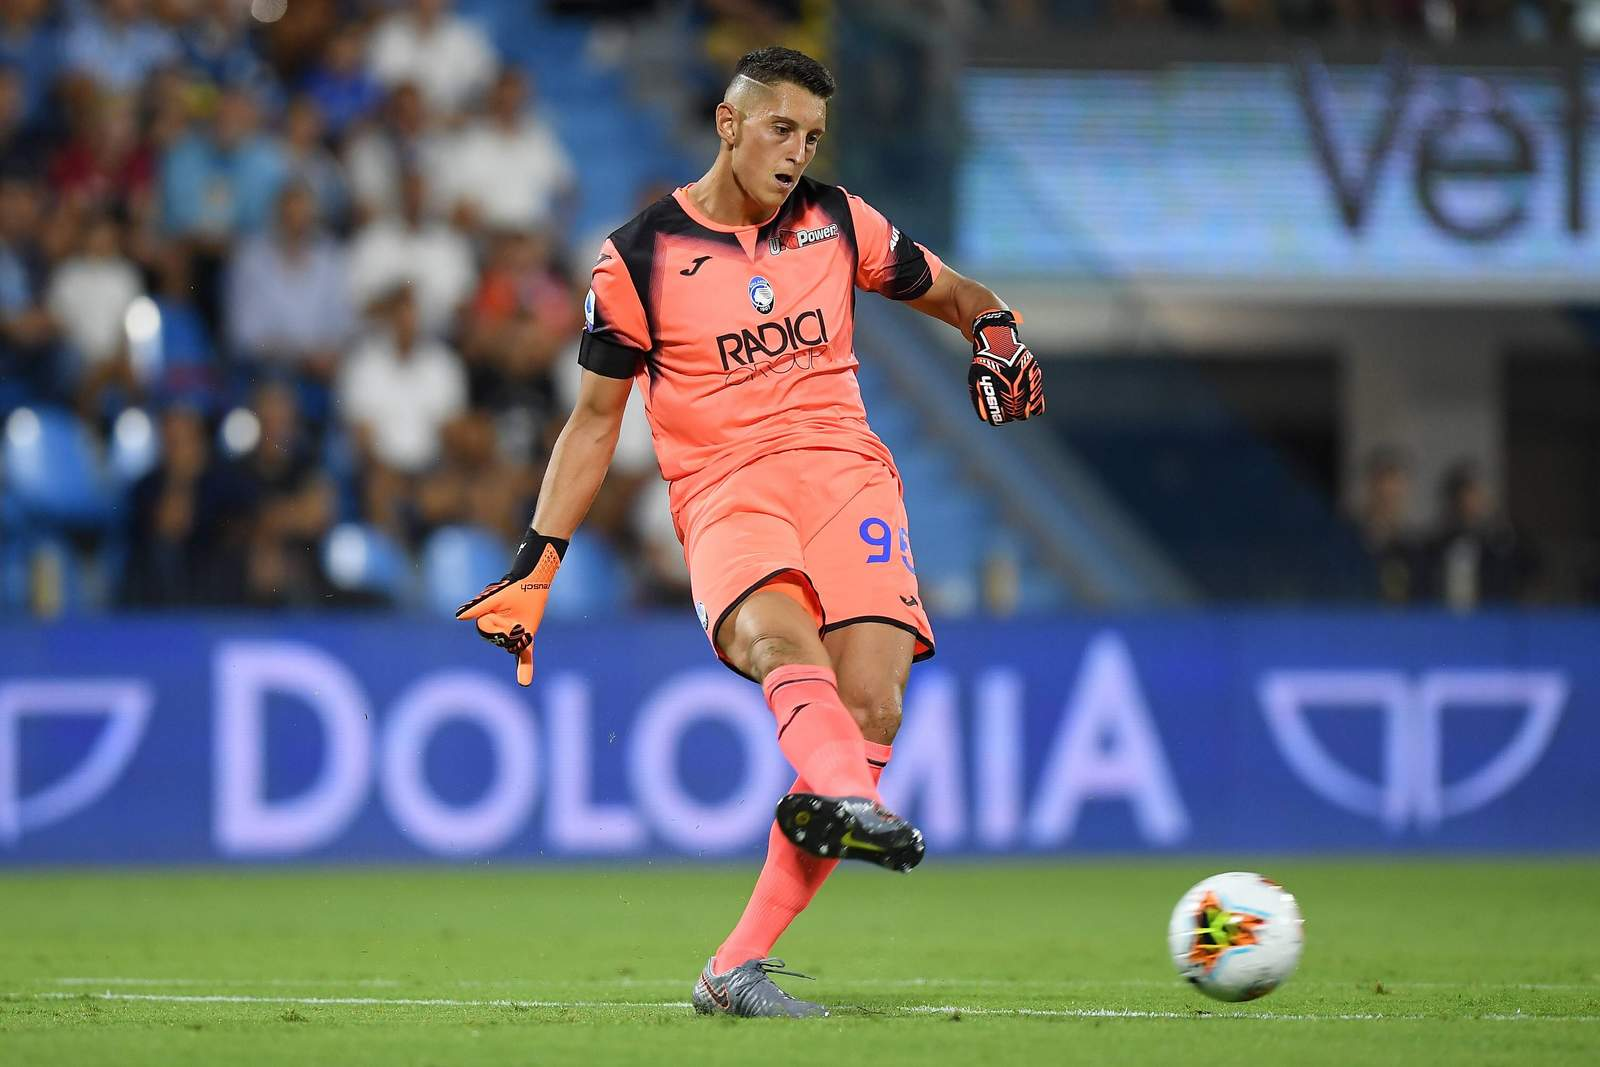 Spielt Gollini zu Null? Jetzt auf Dinamo Zagreb gegen Atalanta Bergamo wetten